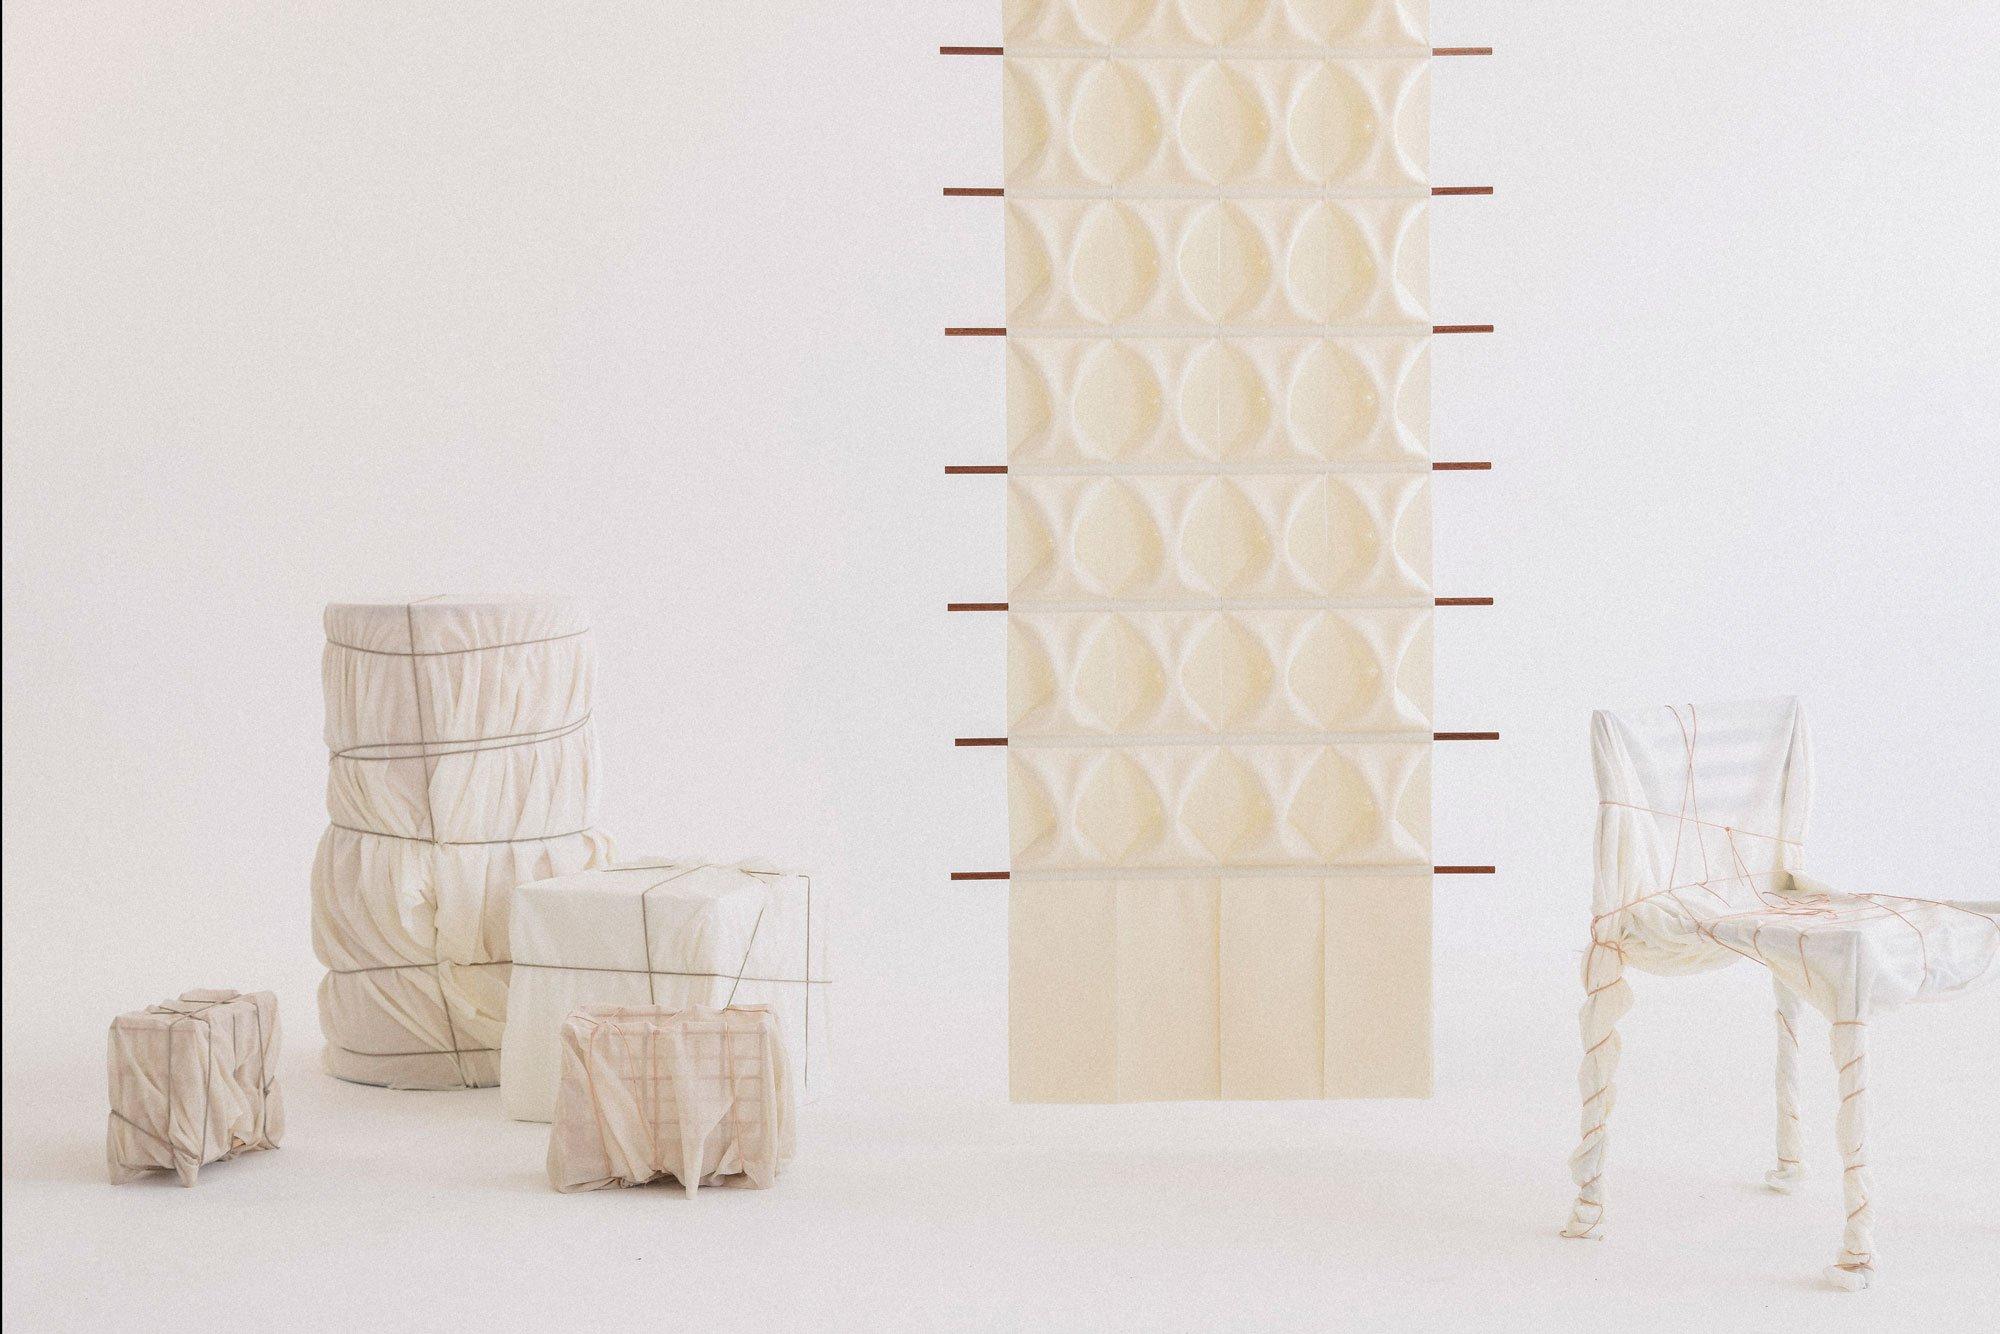 Ukurant Objects, 3daysofdesign 2020, jeunes designers, Felicia Arvid